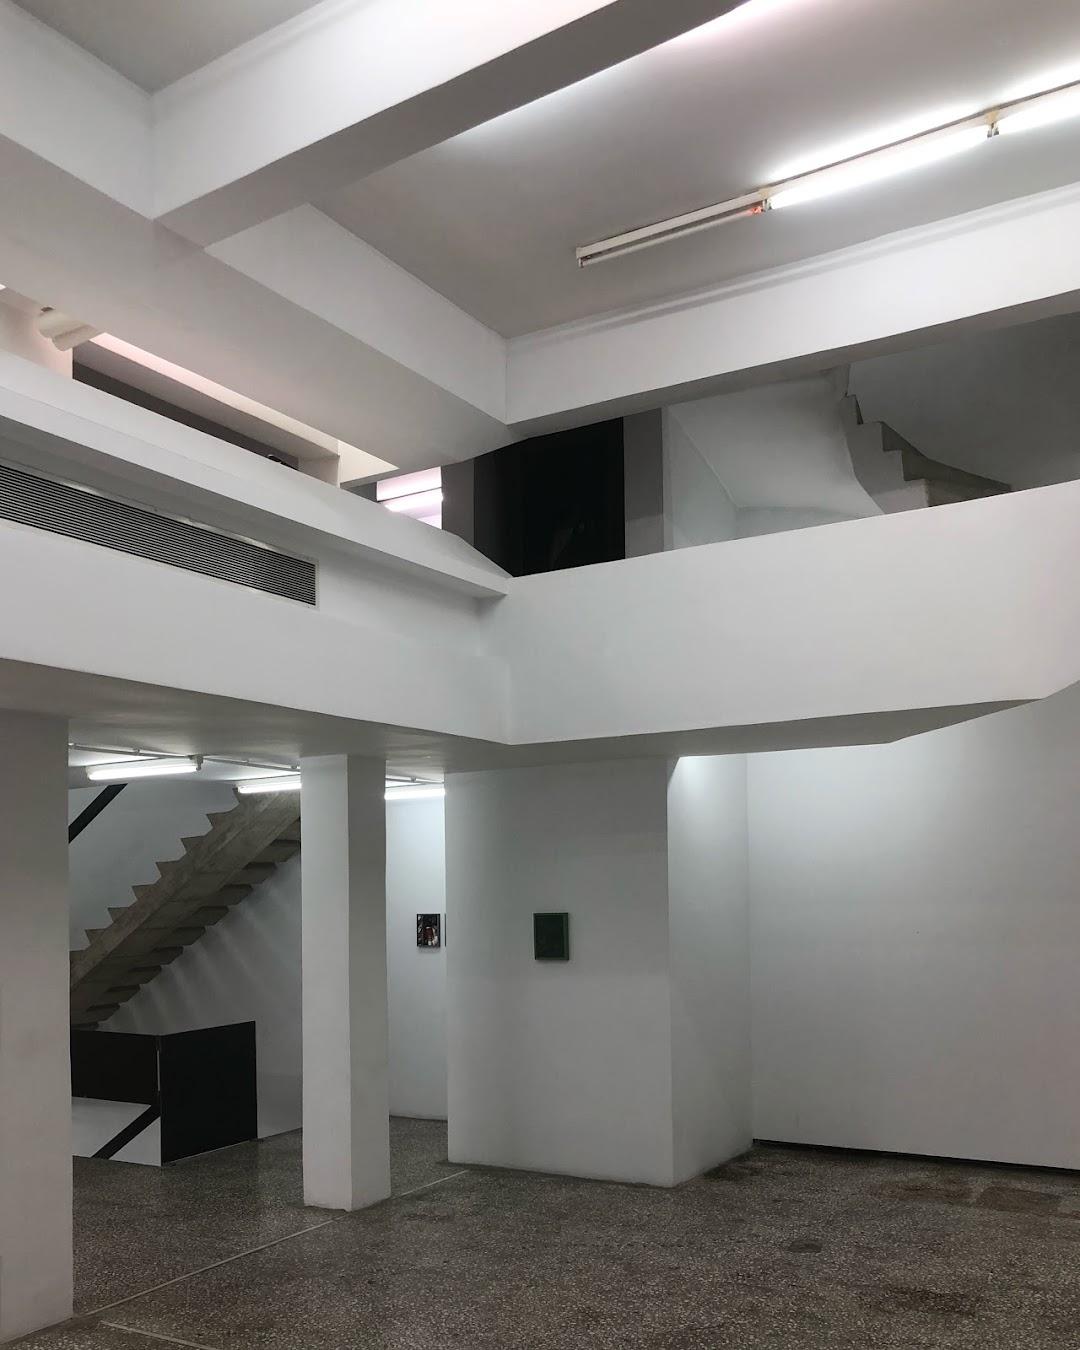 Breeder Gallery (The)